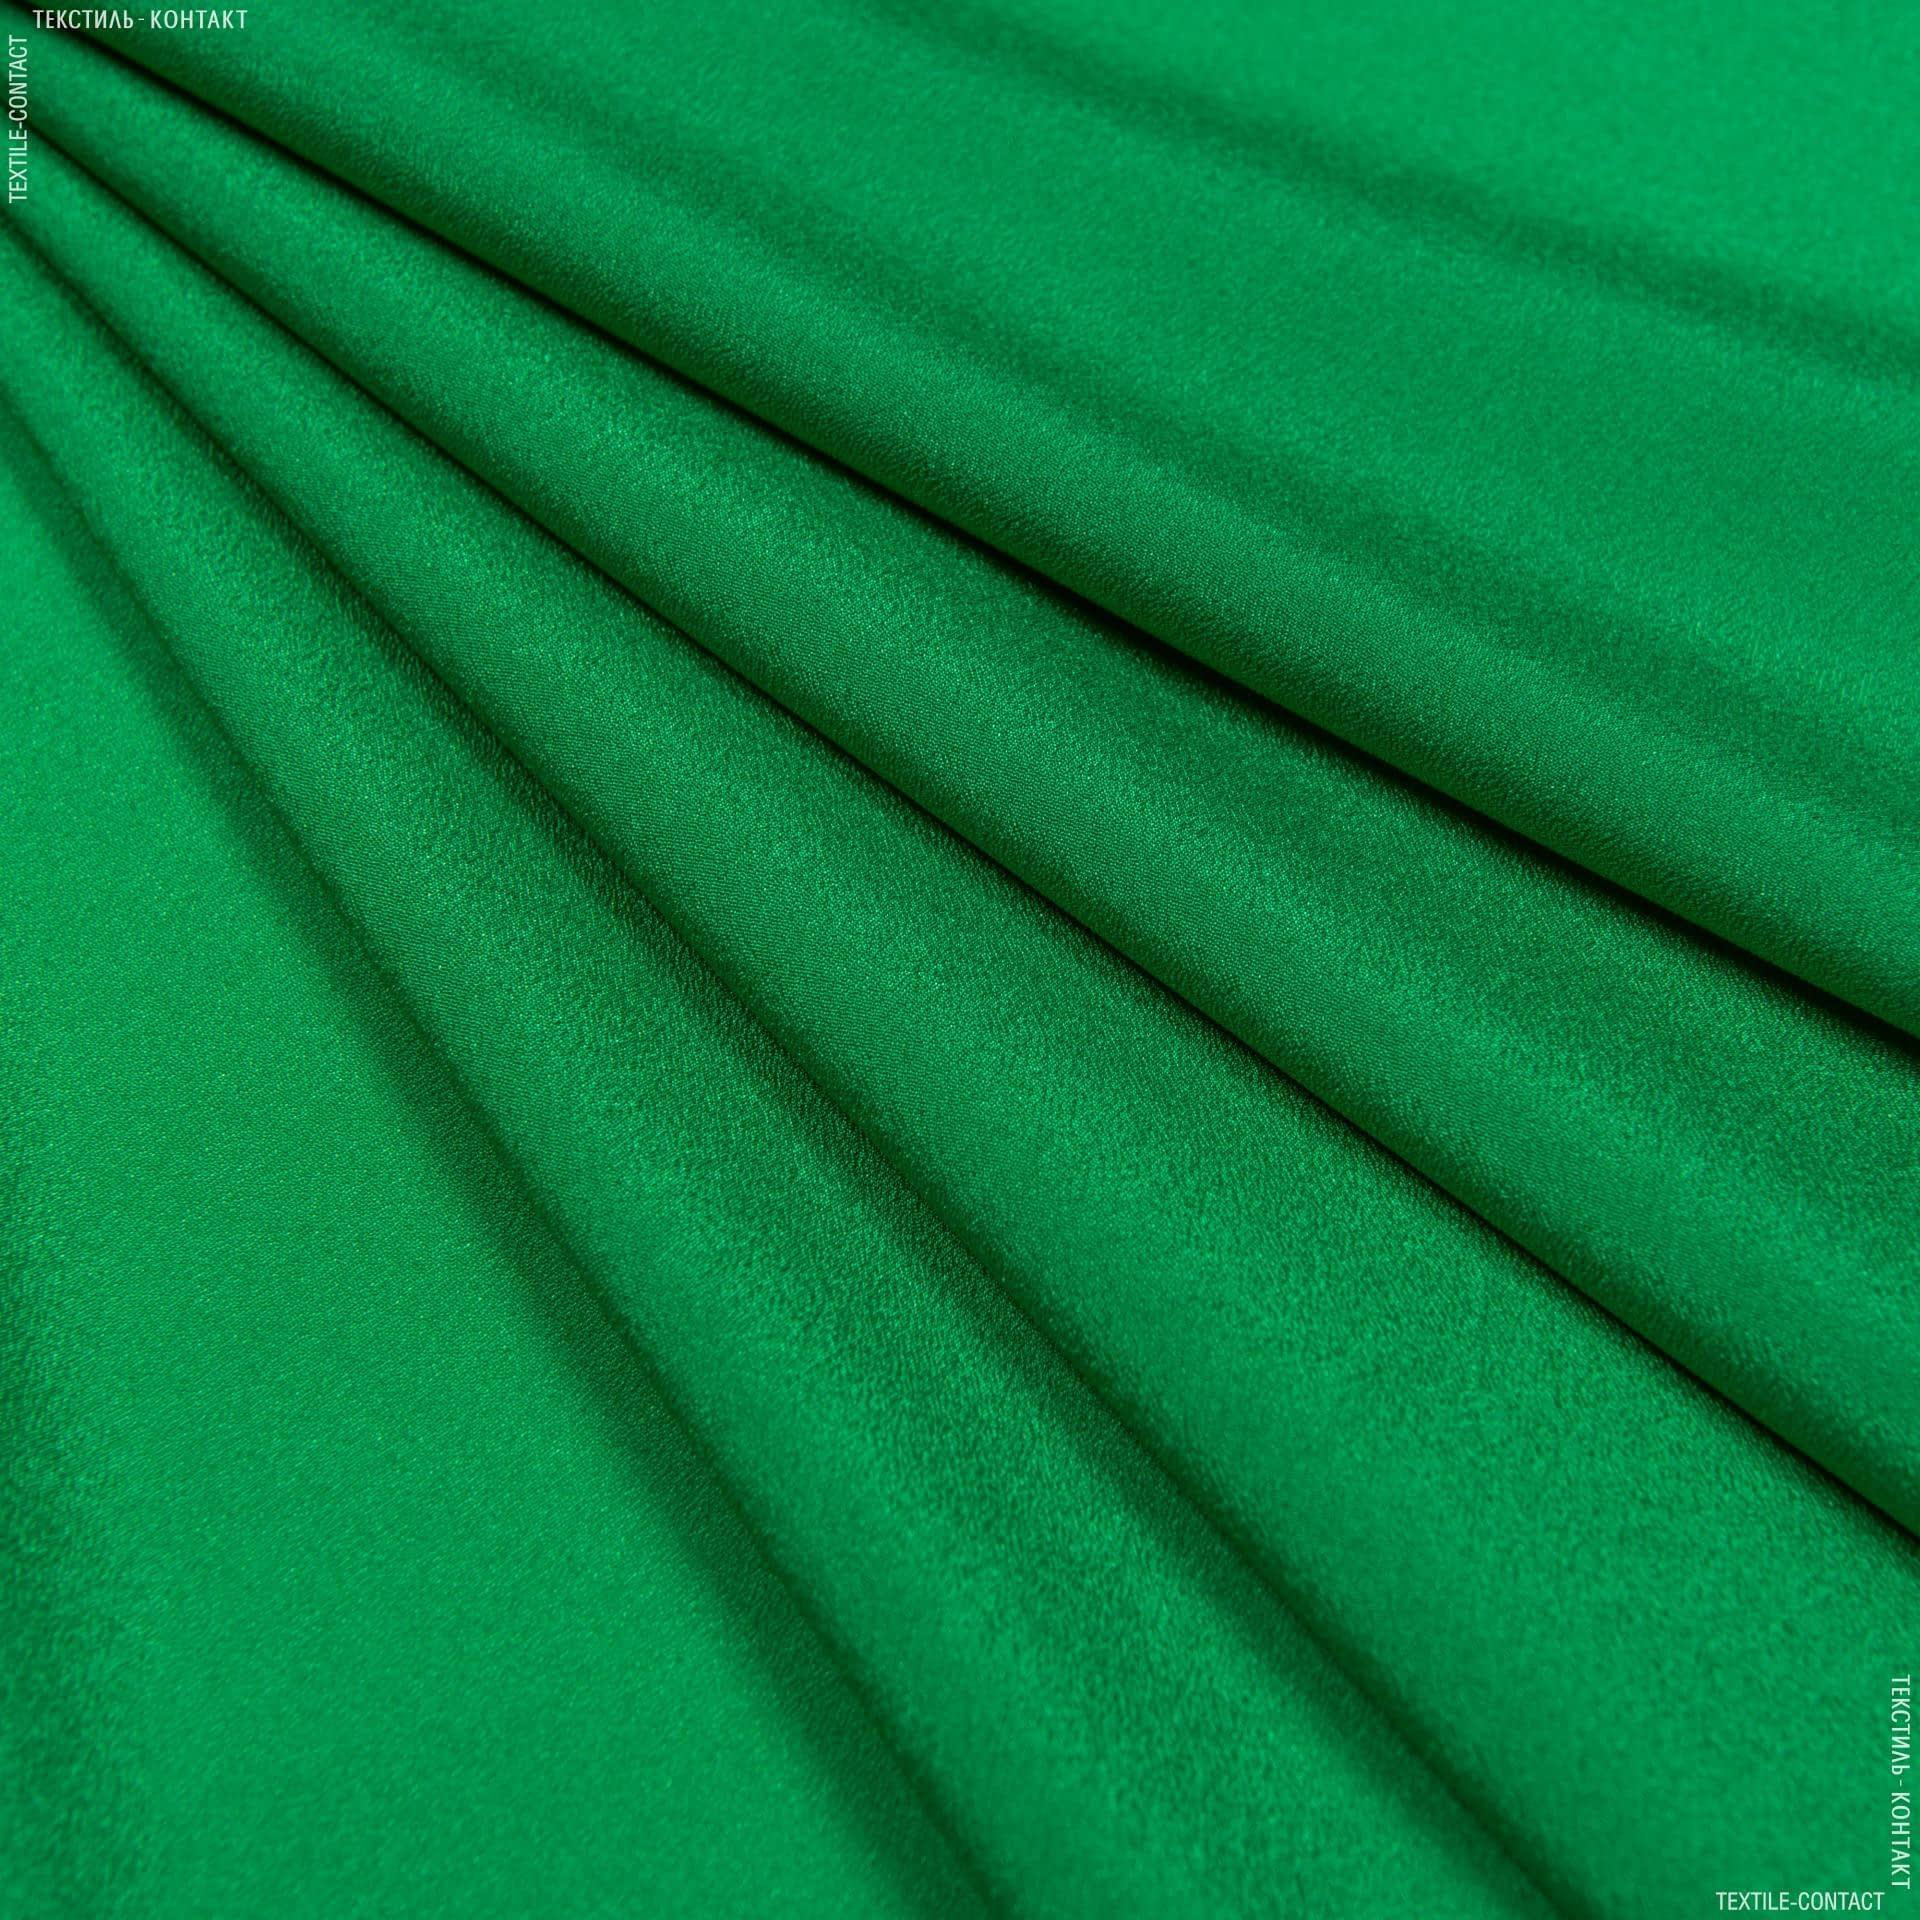 Ткани для платков и бандан - Крепдешин трава